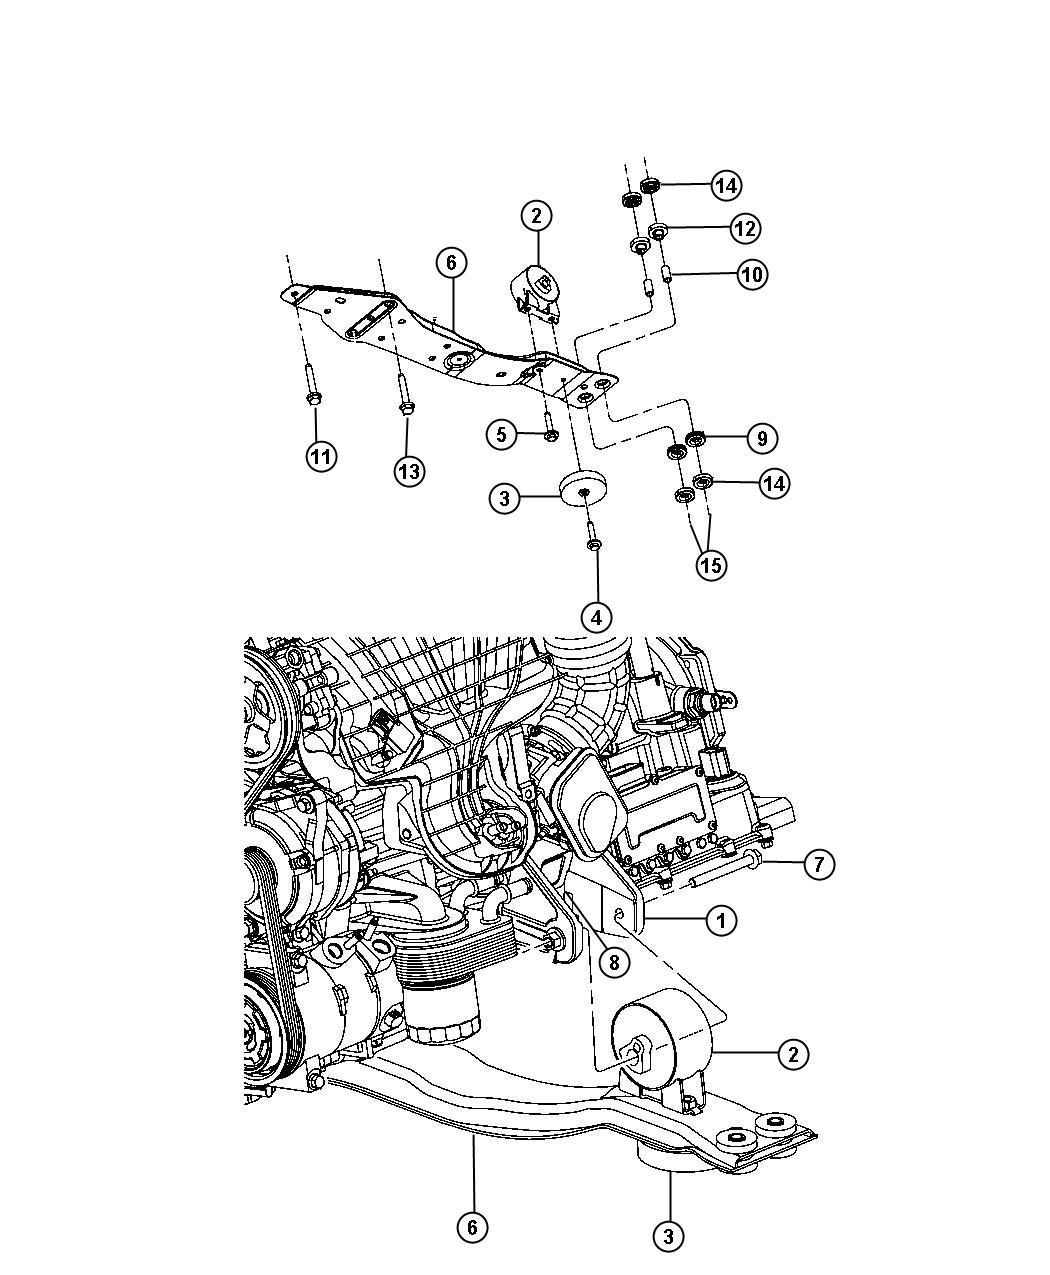 Dodge Avenger Bushing Isolator Front 2 4l 4 Cyl Dohc